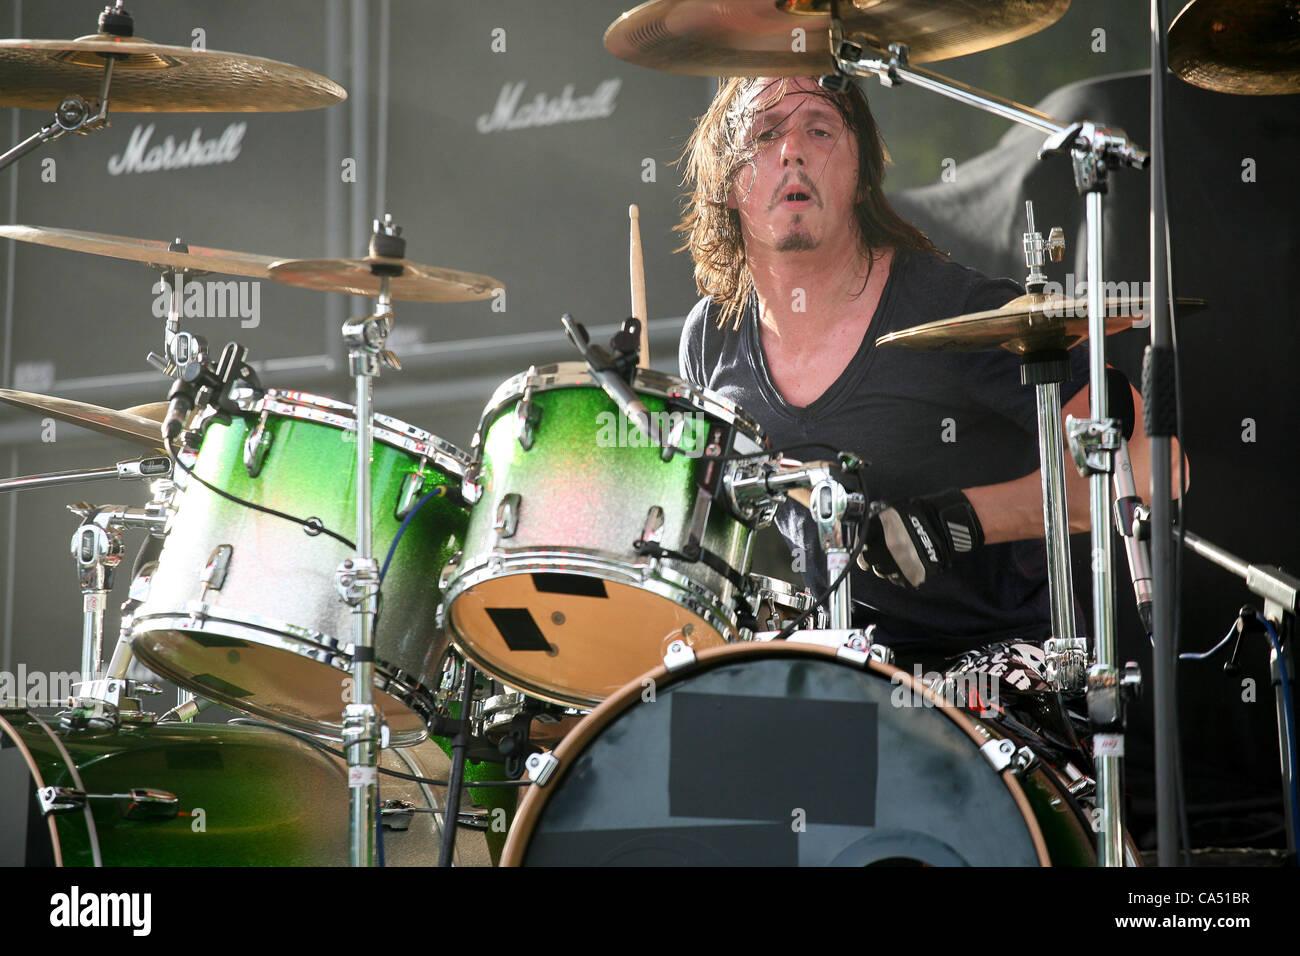 ZAGREB, CROATIA, June 8 2012. Mario Duplantier (drums) of the band Gojira performing at Rokaj (trans: Rock!) festival - Stock Image